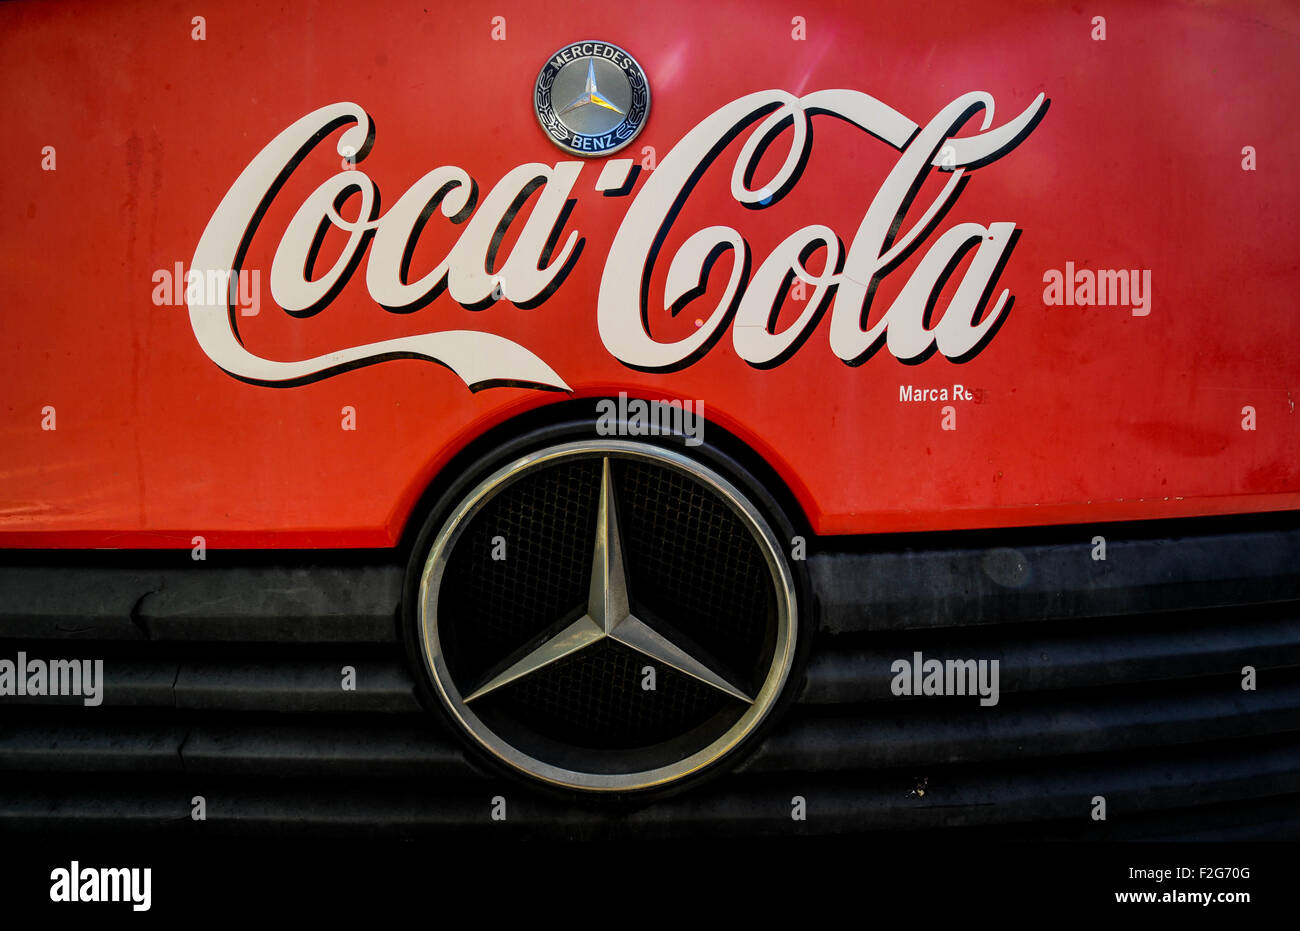 delivery truck of Coca Cola, Mercedes-Benz- el camión de reparto de Coca Cola, Mercedes-Benz - Stock Image